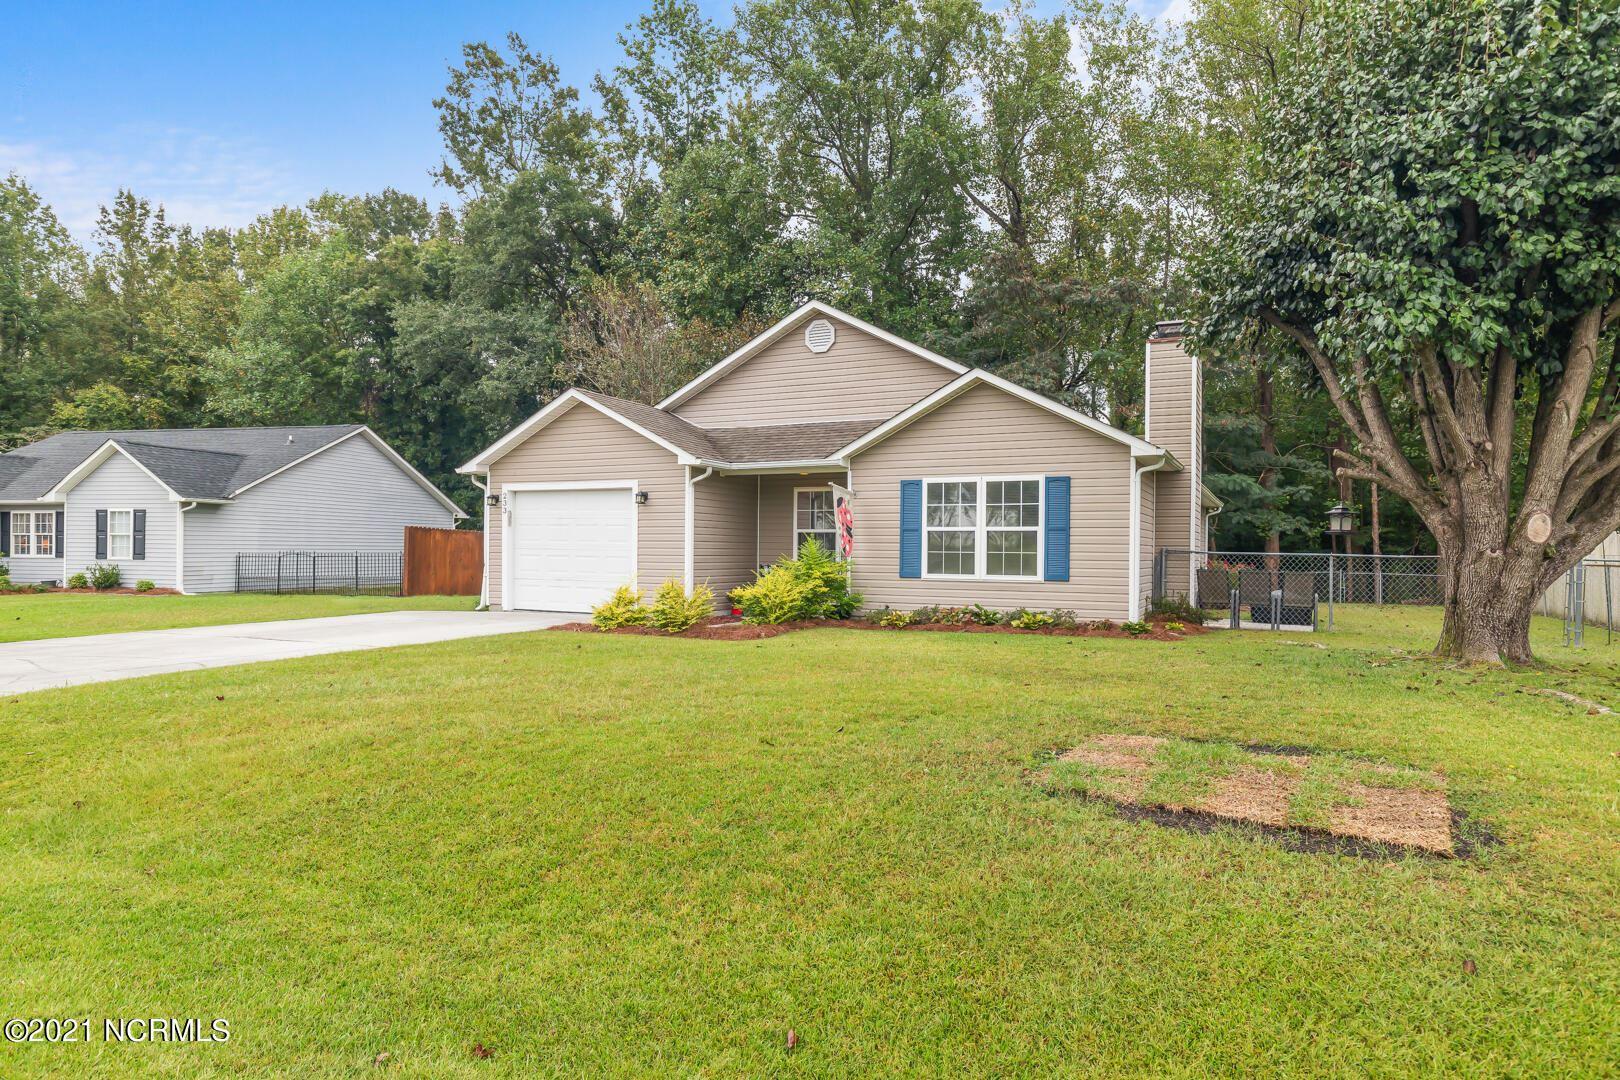 Photo of 233 Pollard Drive, Jacksonville, NC 28540 (MLS # 100293732)